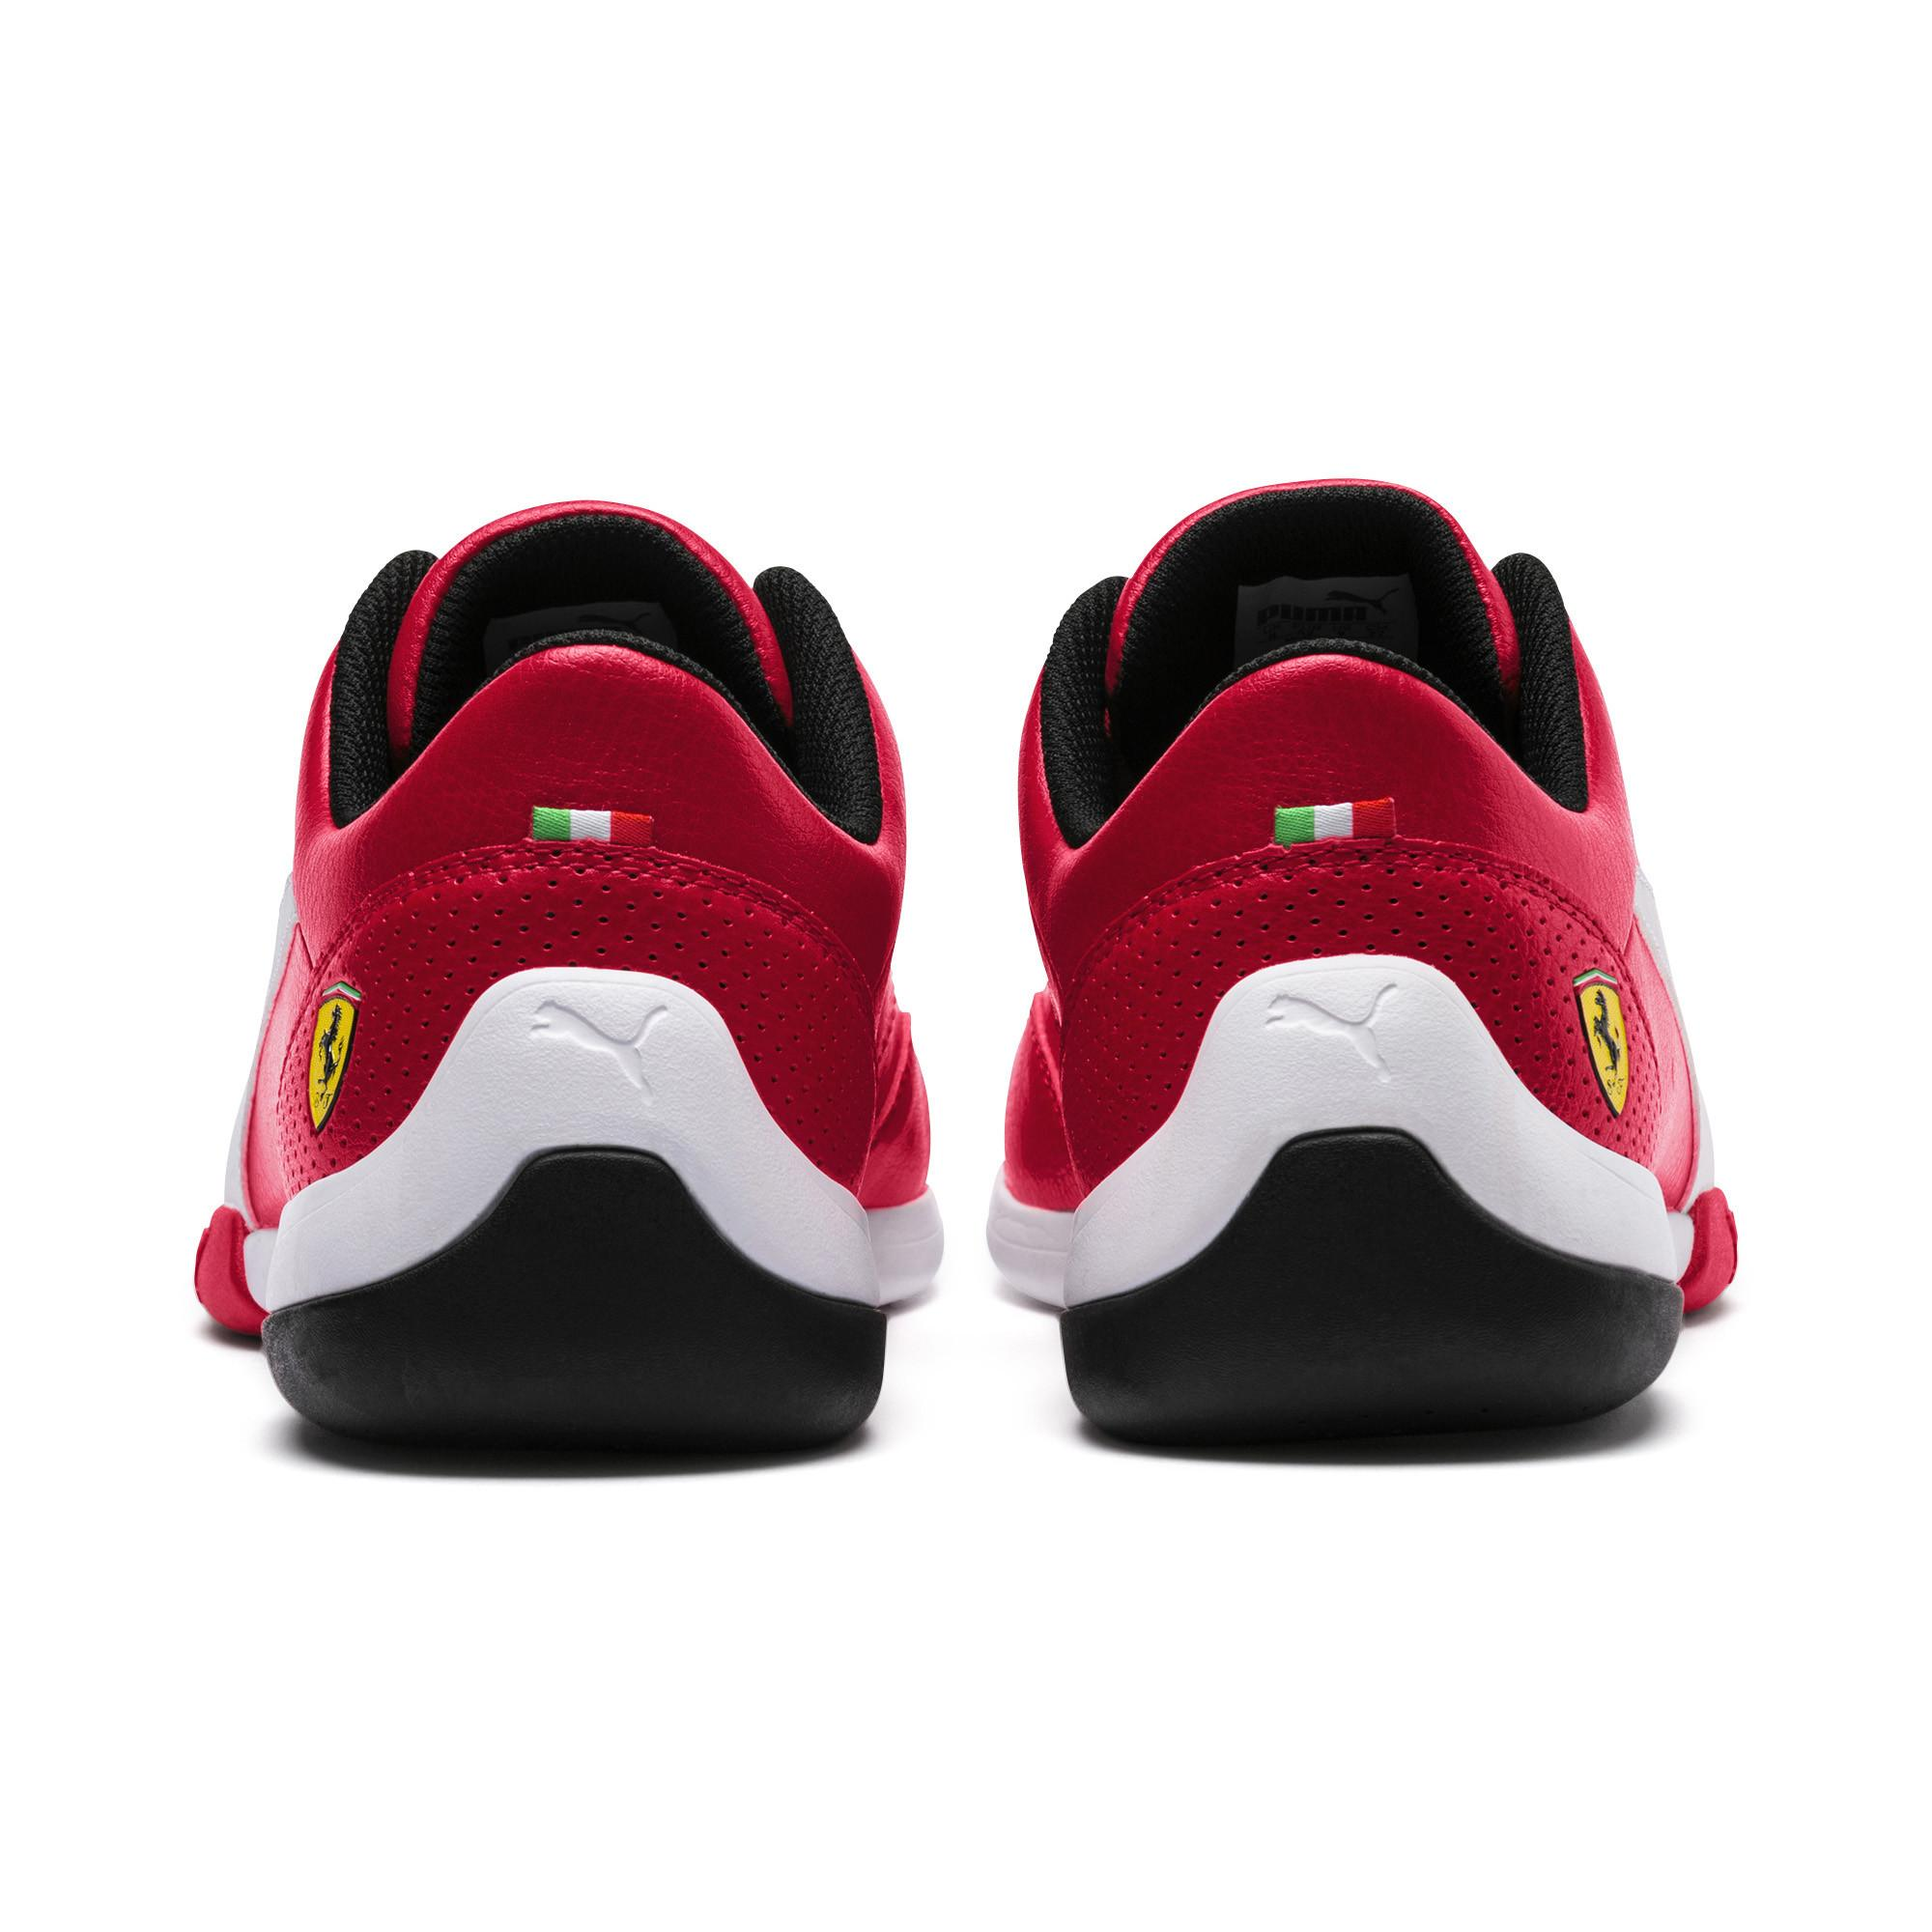 3ab724a4bf4b61 PUMA - Red Scuderia Ferrari Kart Cat Iii Sneakers for Men - Lyst. View  fullscreen